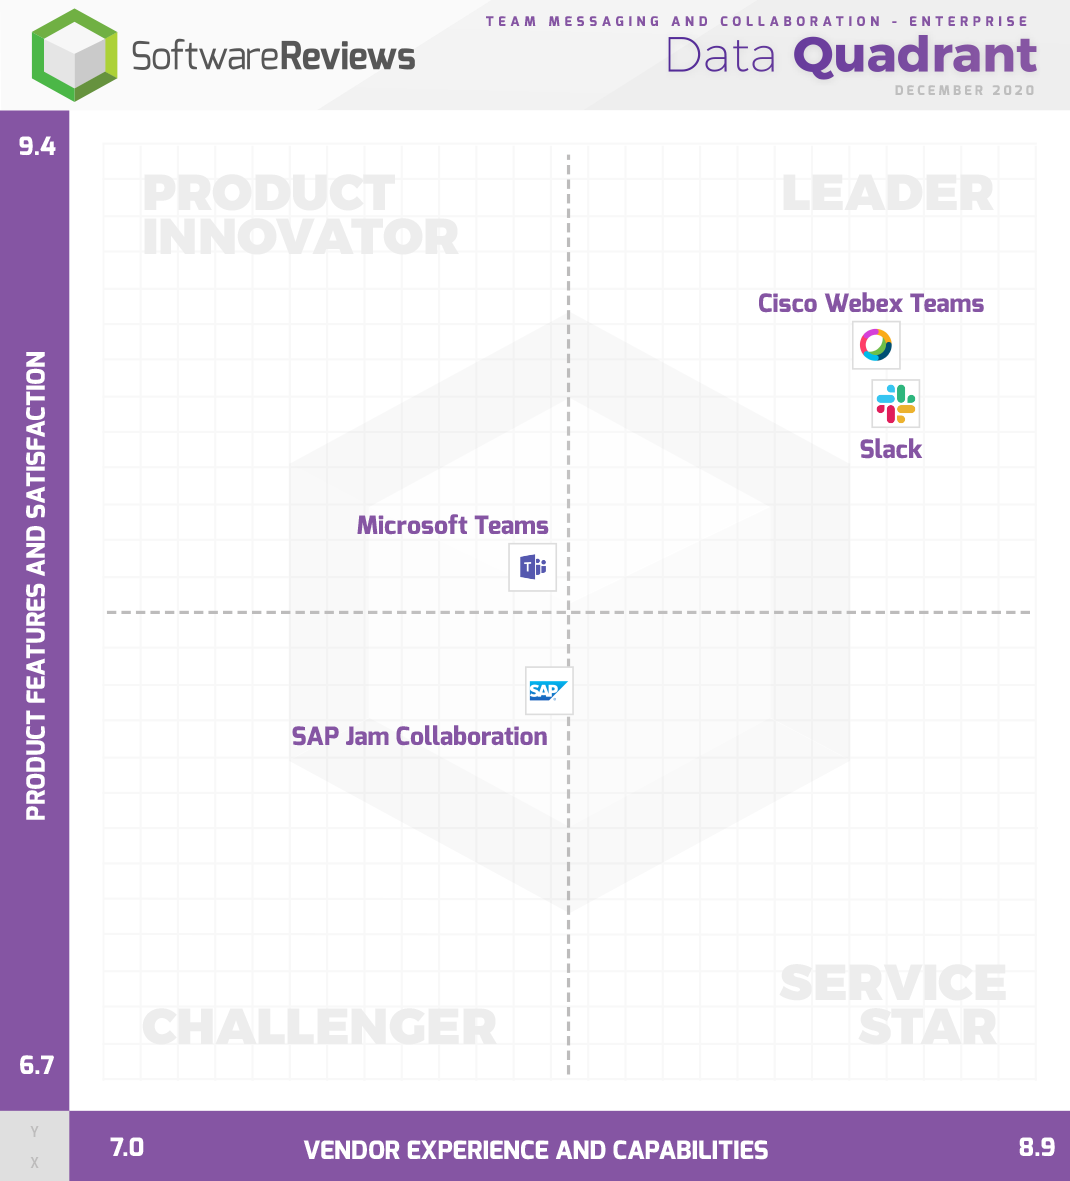 Team Messaging and Collaboration - Enterprise Data Quadrant